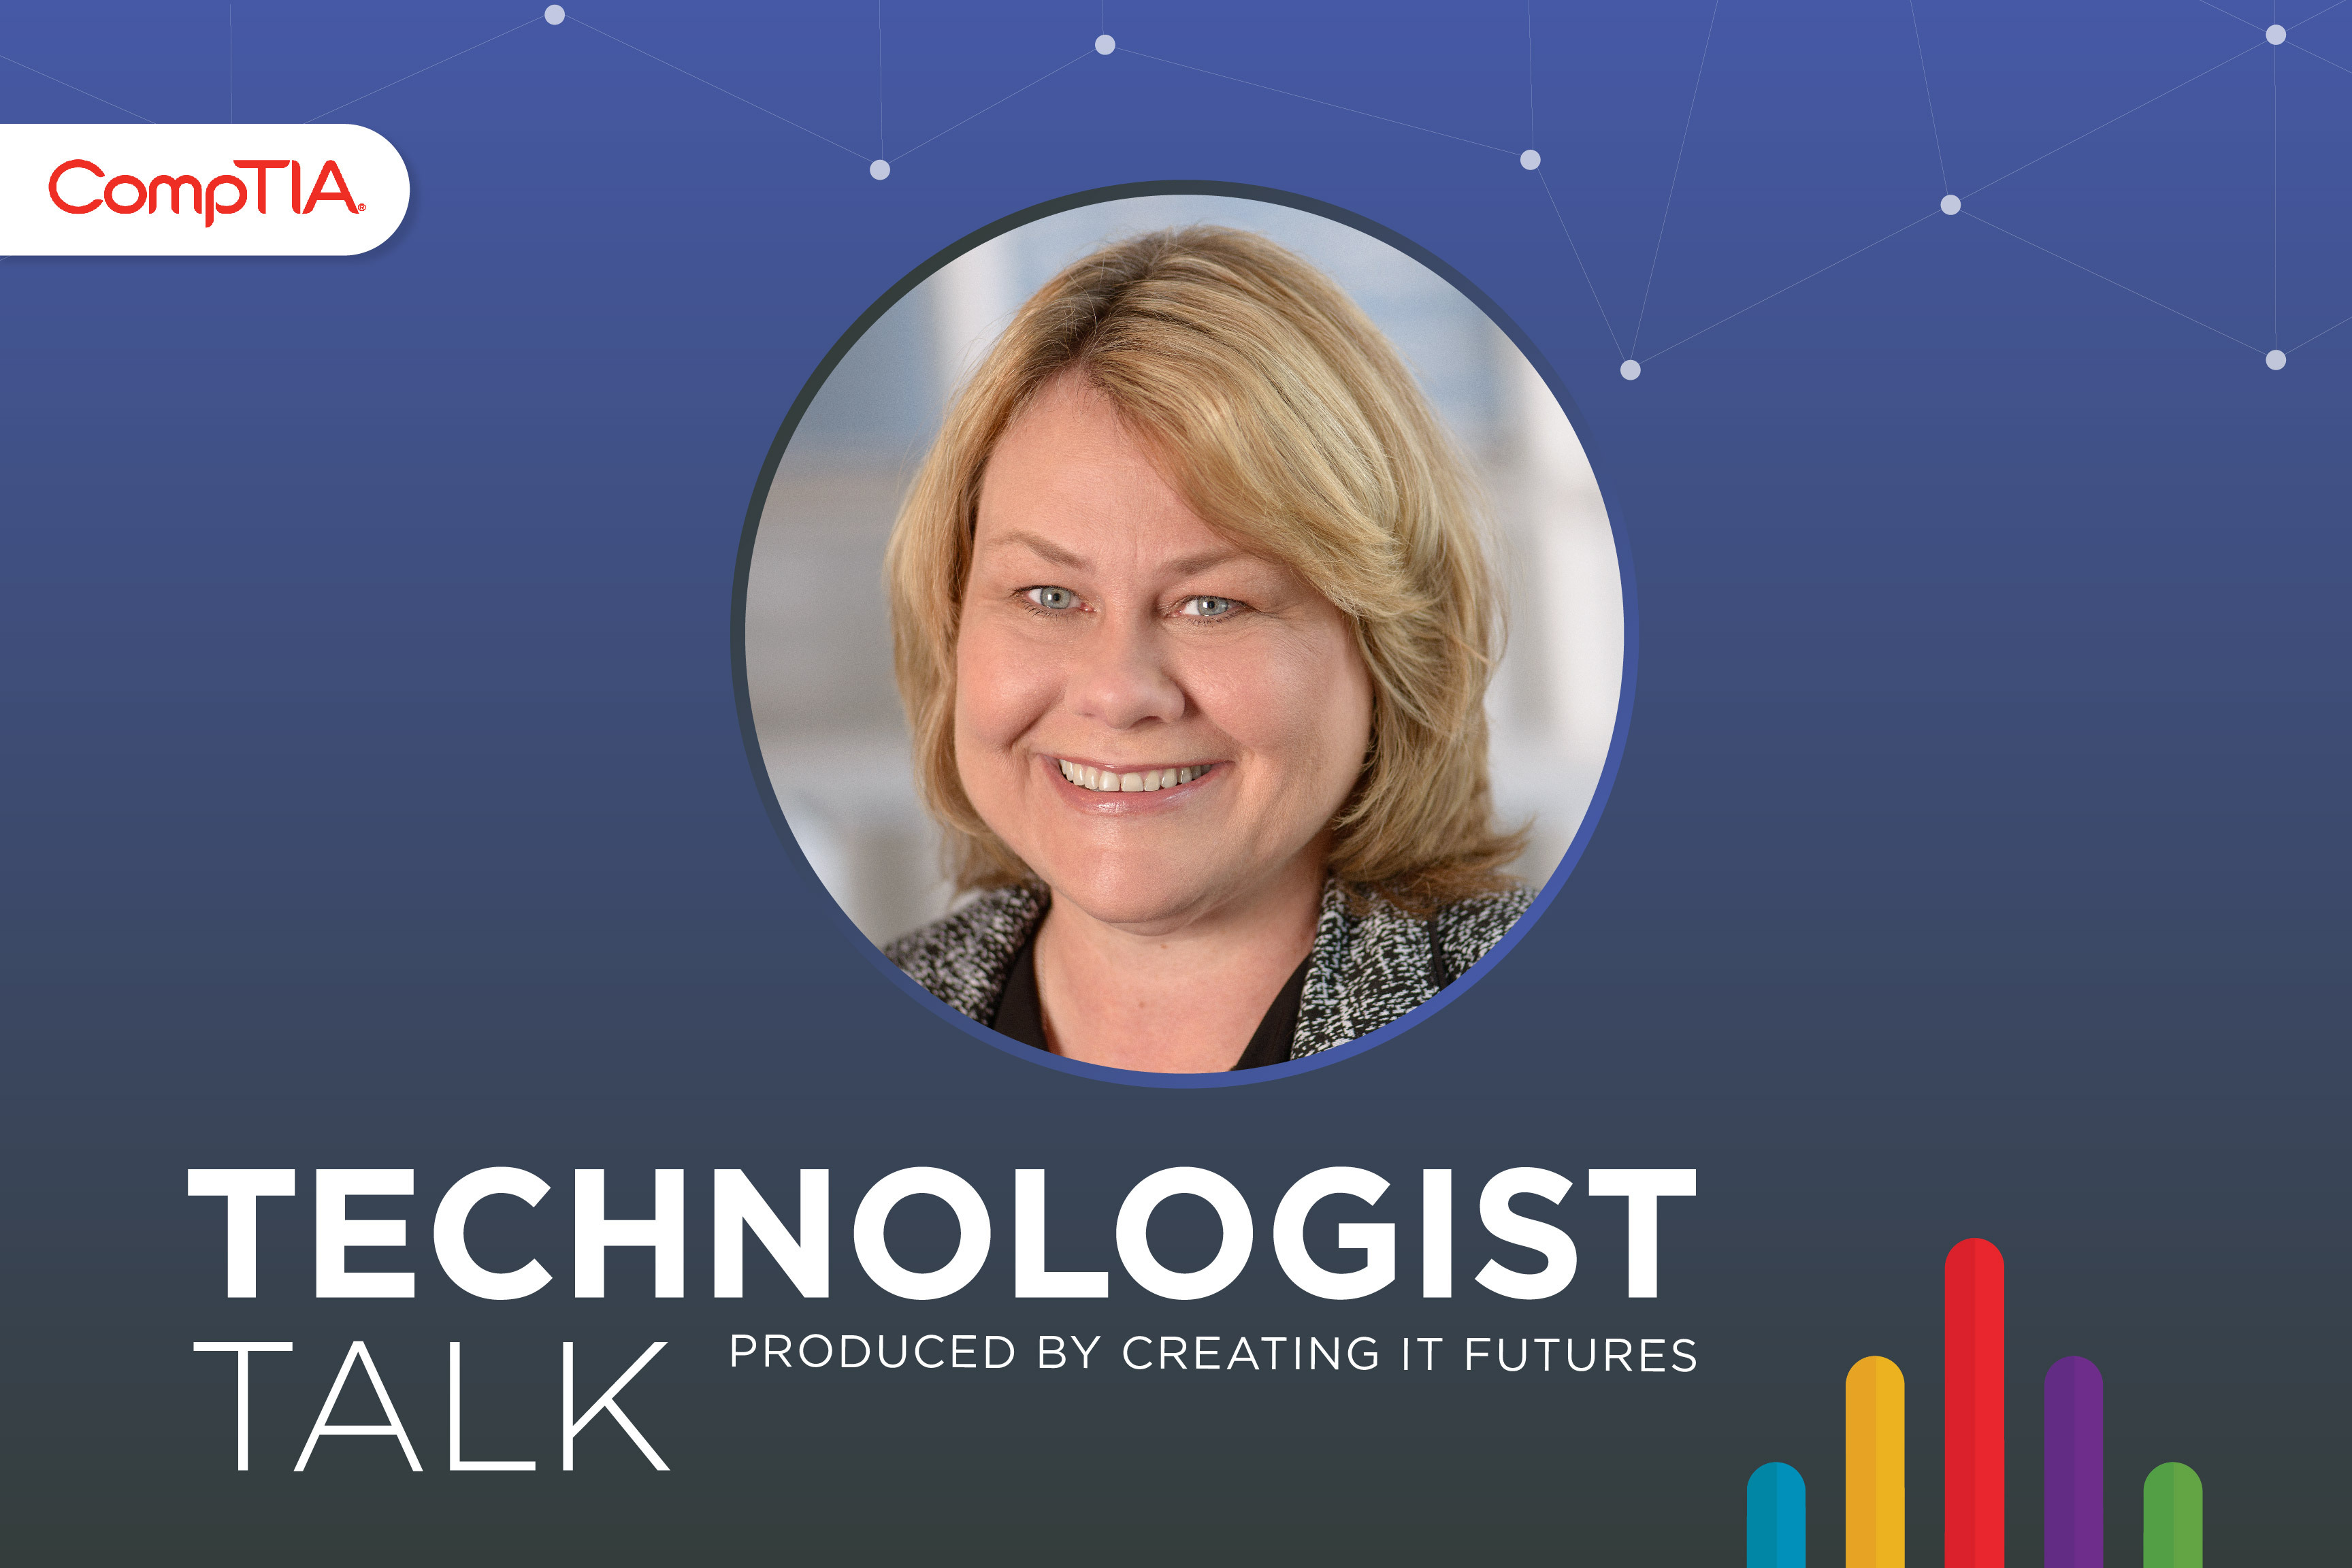 Nancy Hammervik on Technologist Talk